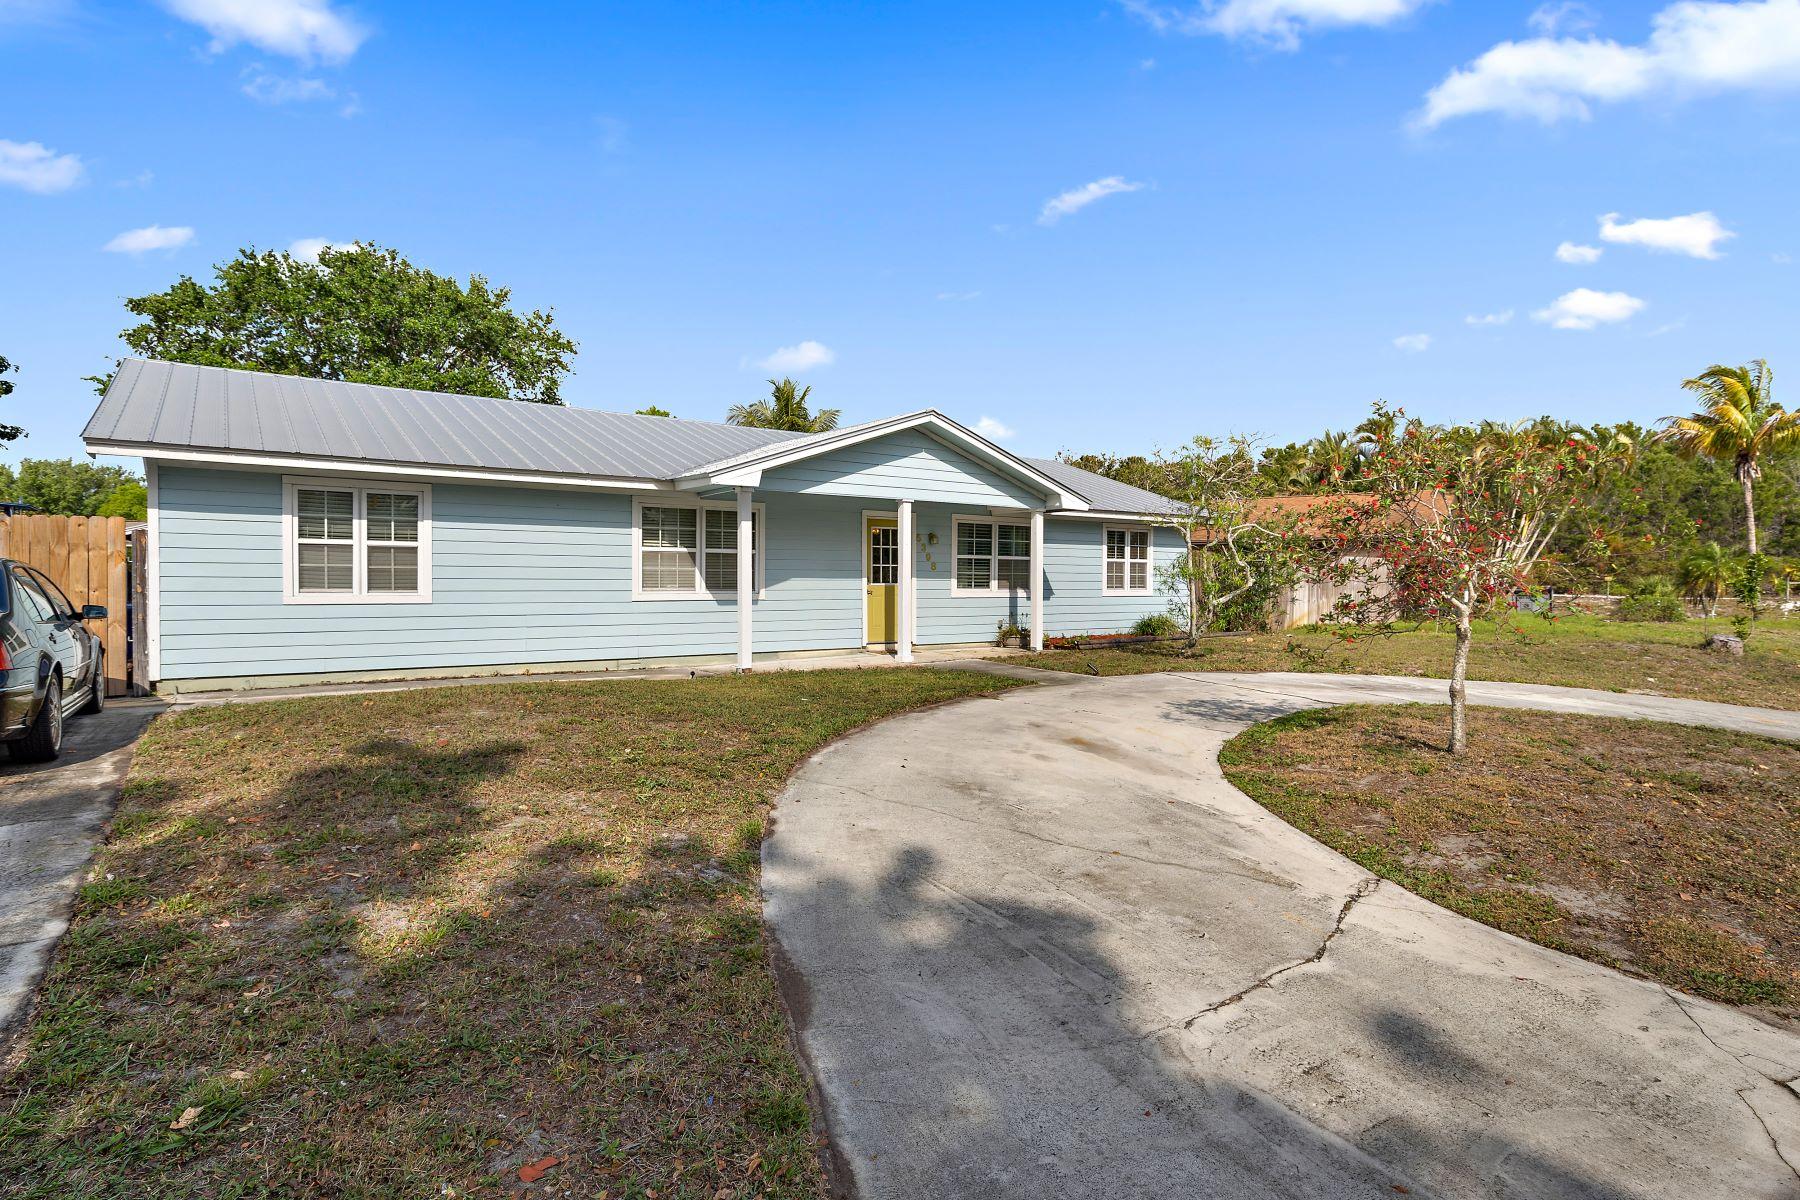 Single Family Home for Sale at 5398 Se 51st Drive Stuart, Florida 34997 United States